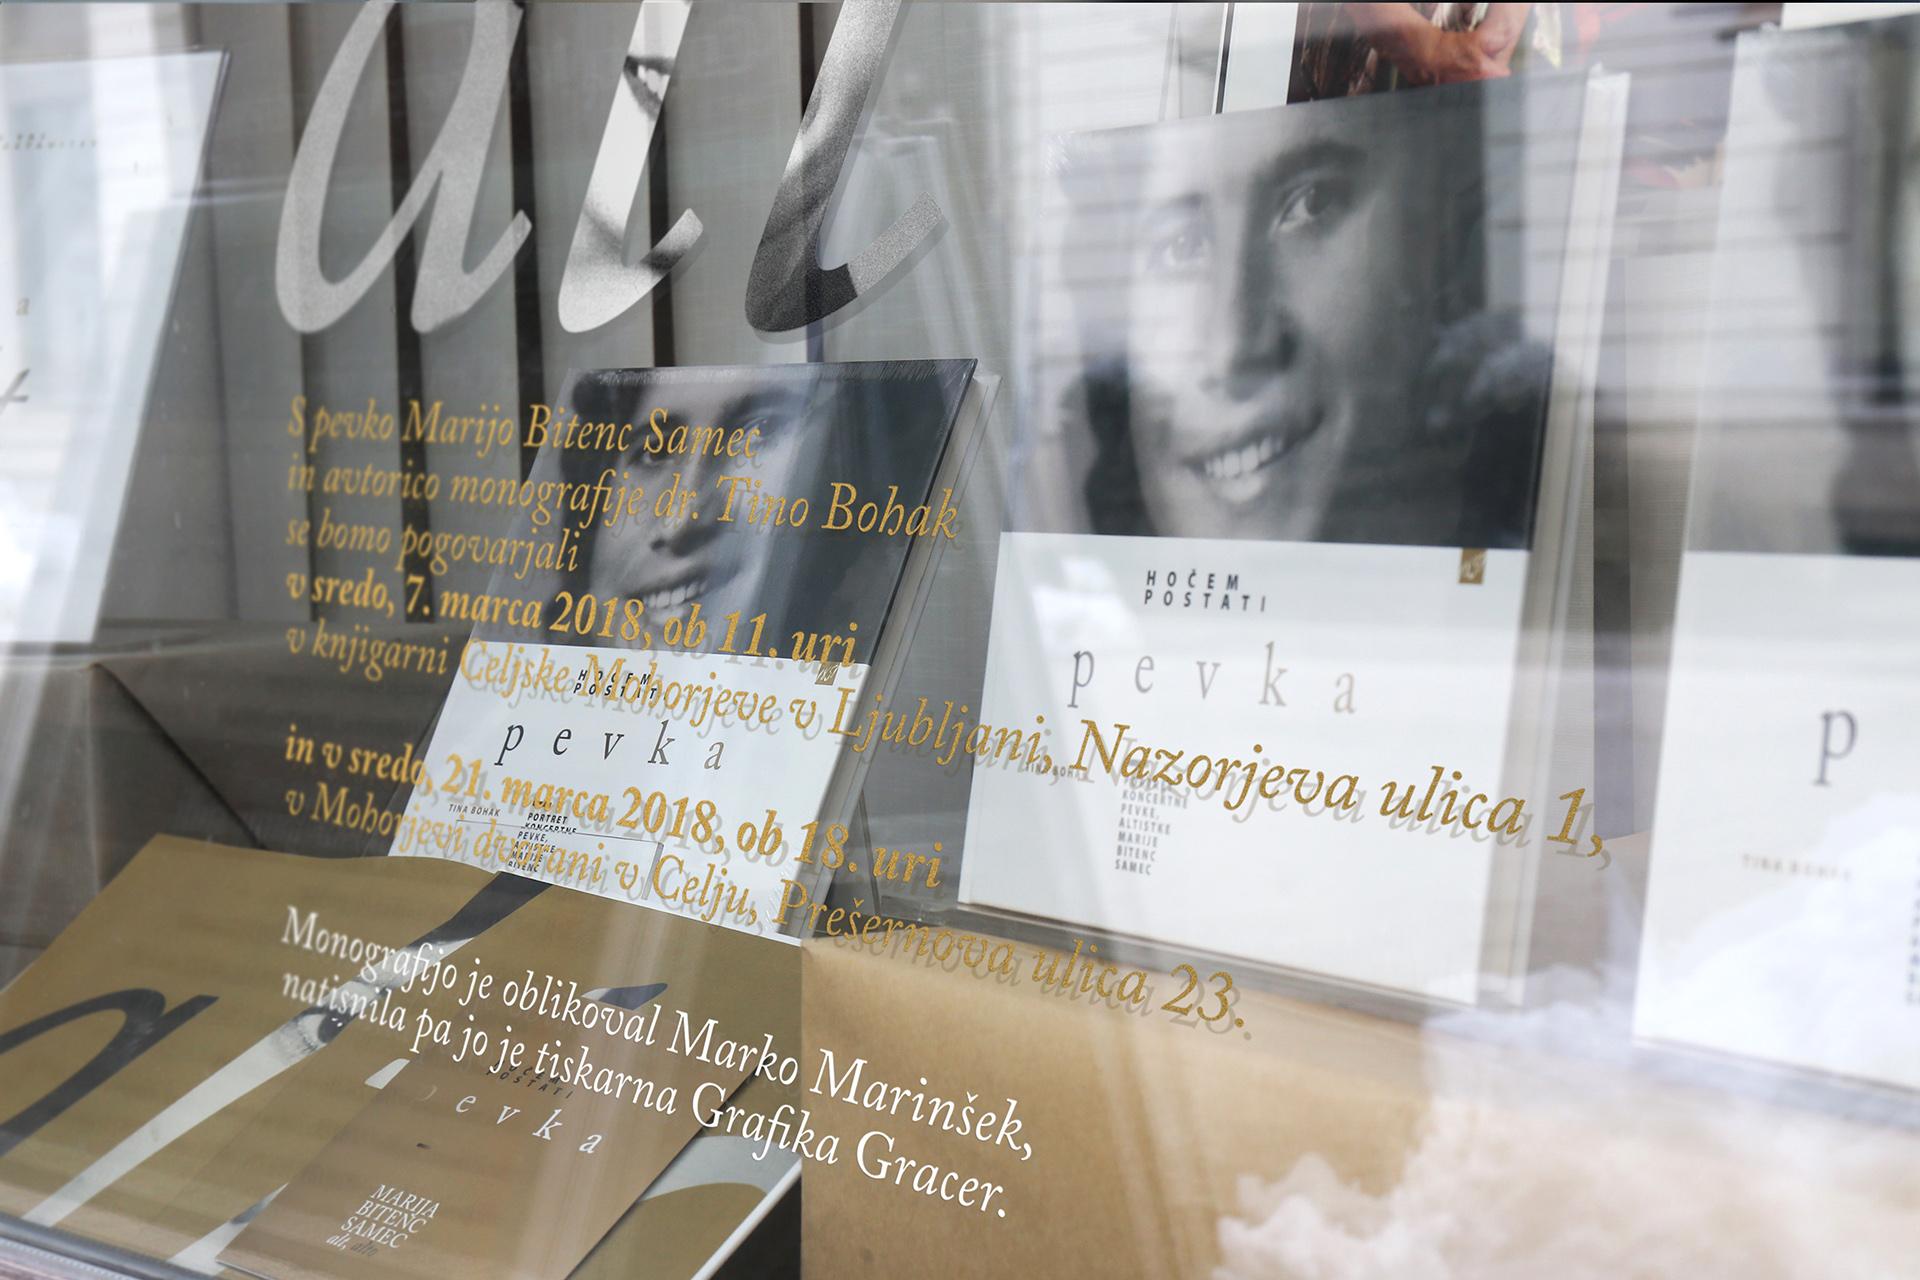 marija_bitenc_samec_knjiga_marko_Marinsek_mohorjeva_2018 copy